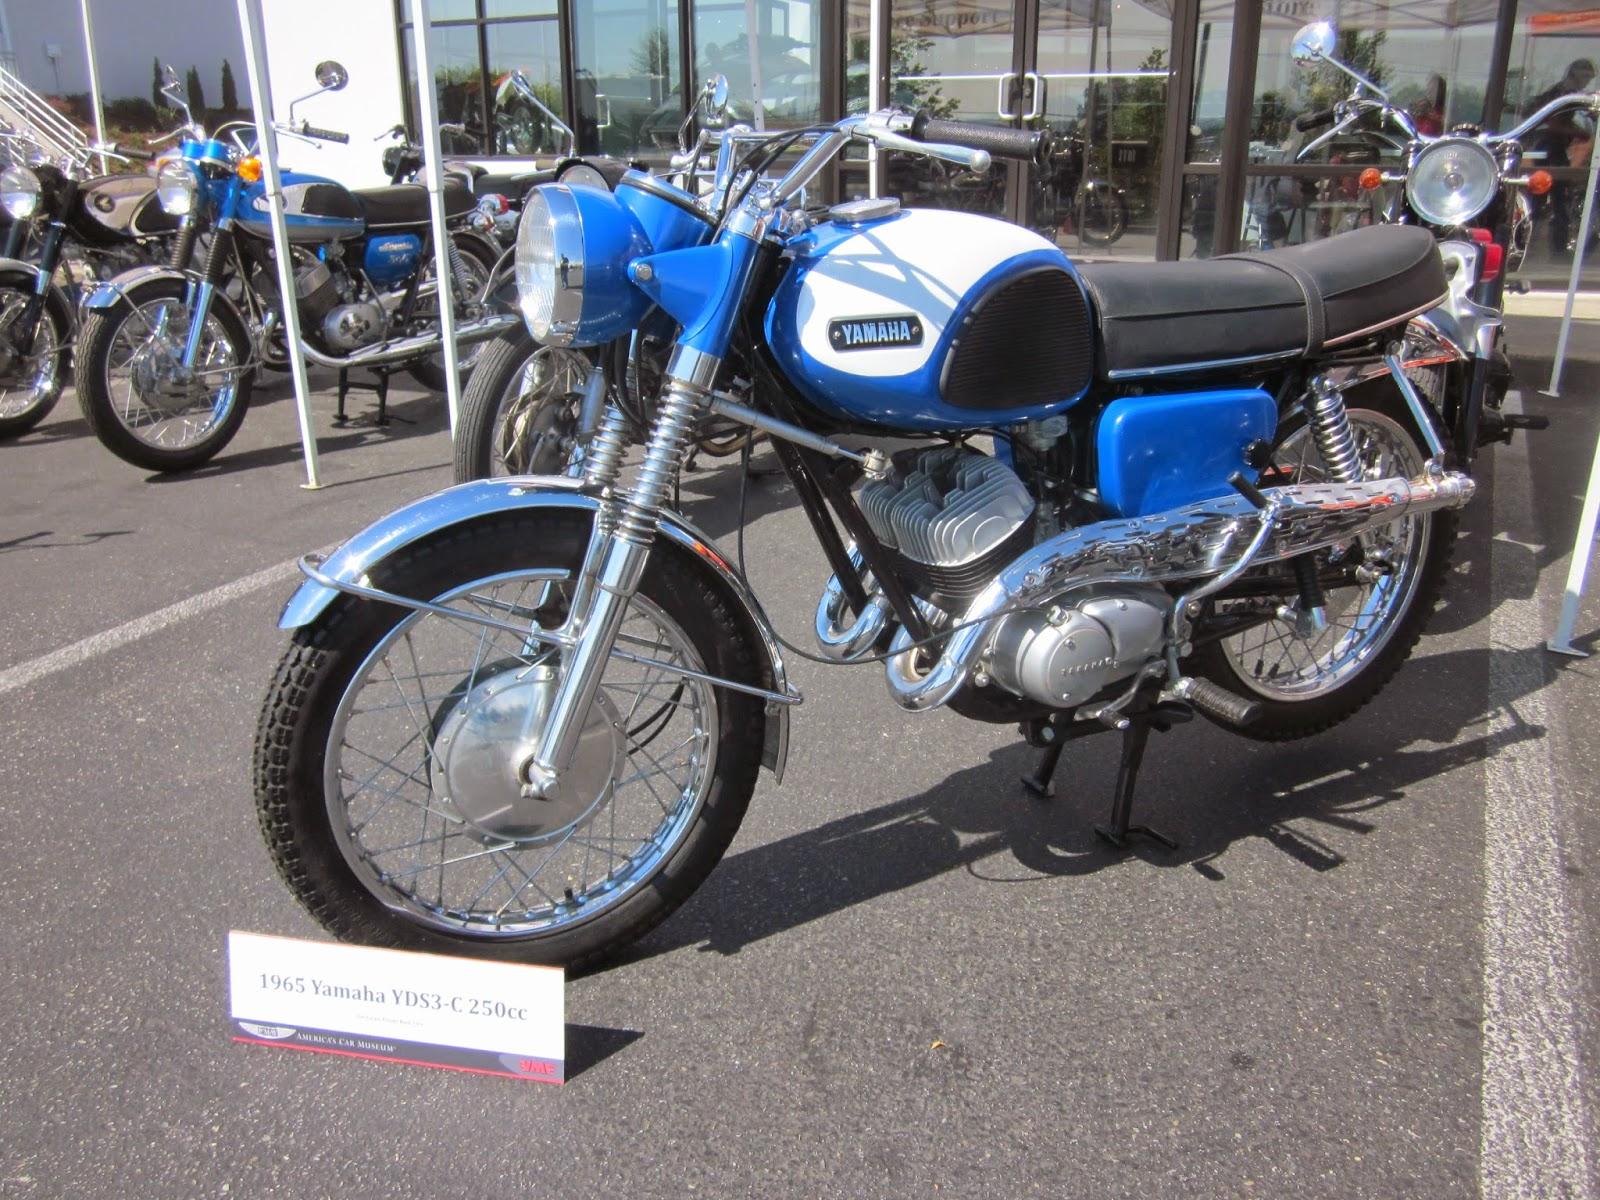 Oldmotodude 1965 yamaha yds3 c 250 on display at the 2014 for Hinshaw honda auburn wa